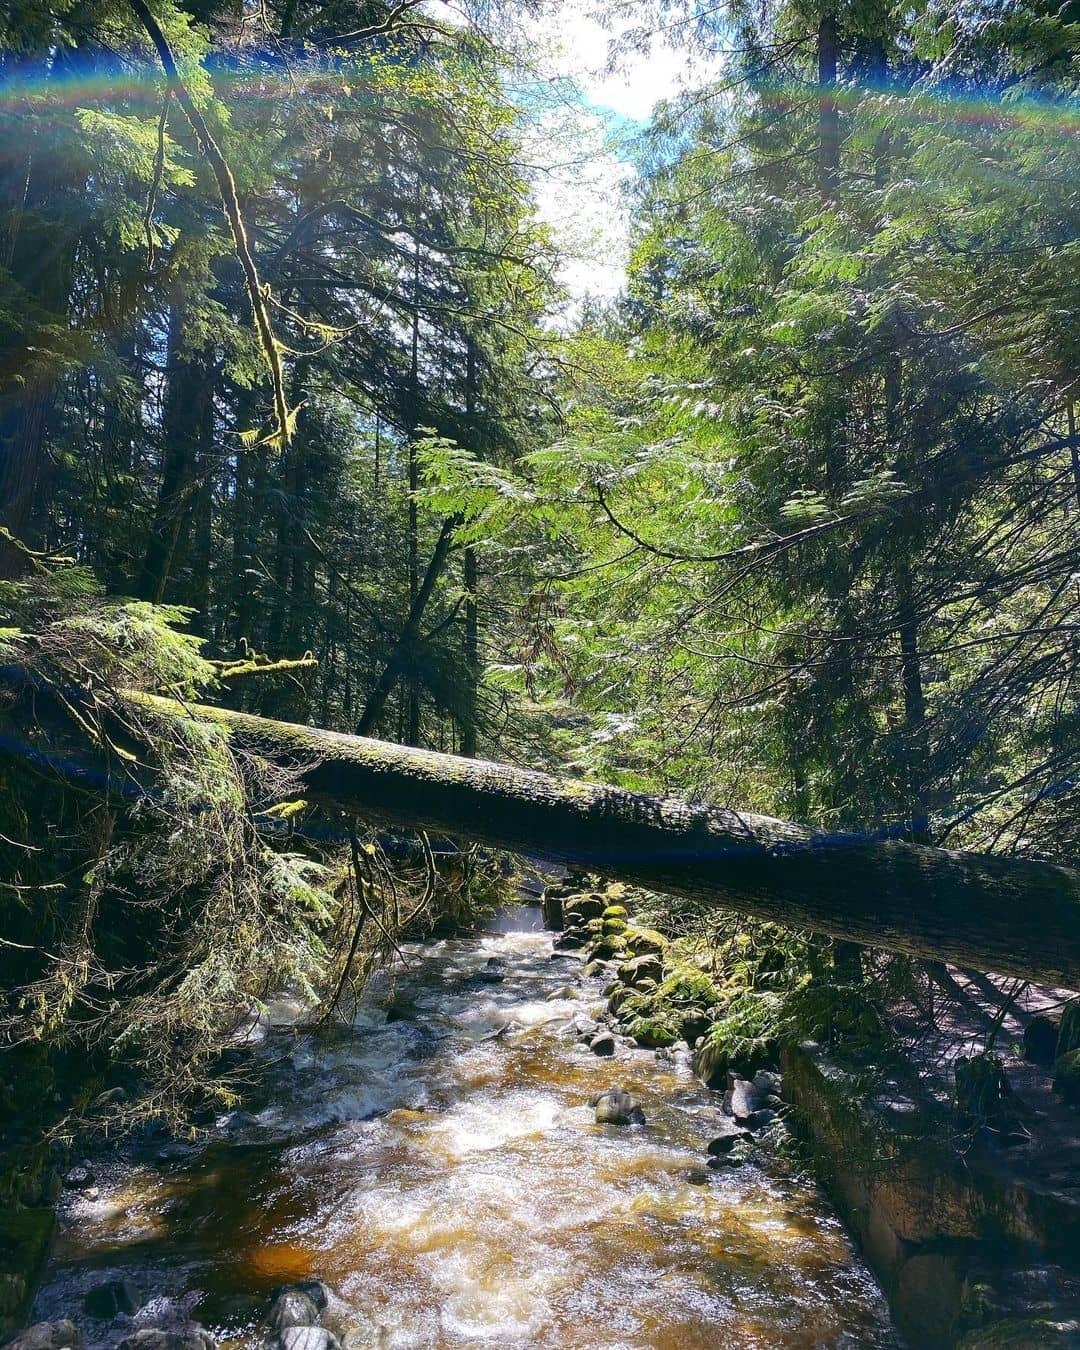 Vancouver hidden gems cypress falls park